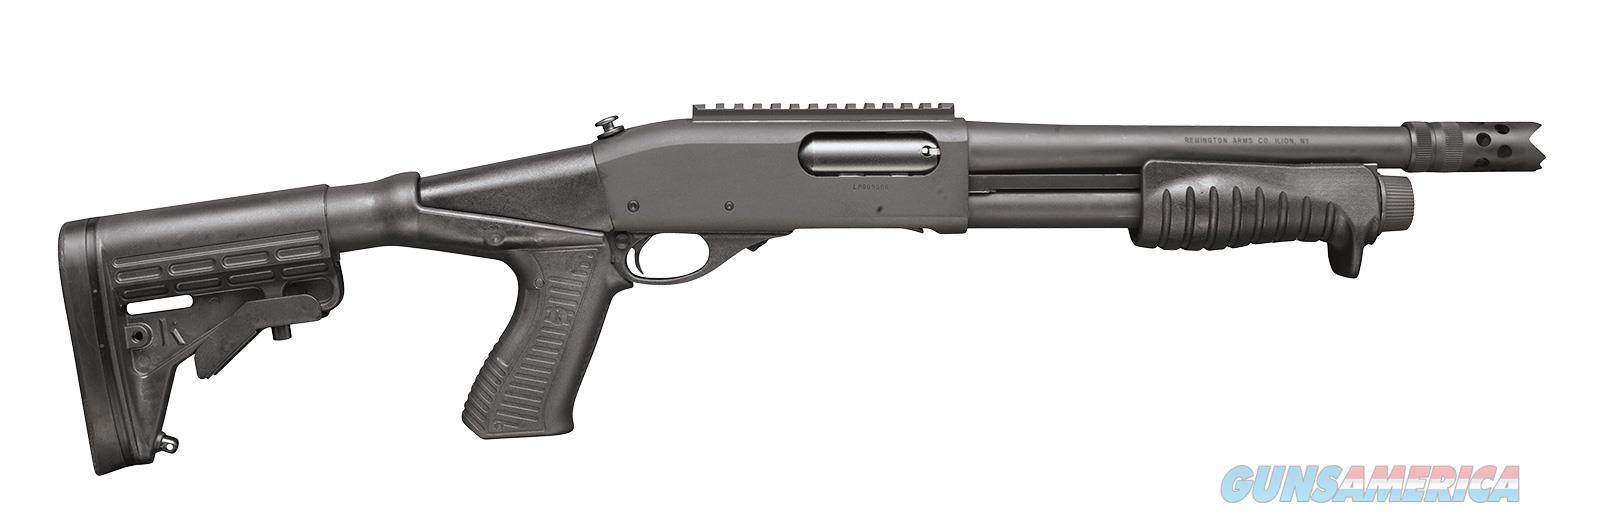 Remington 870 (82710)  Guns > Shotguns > Remington Shotguns  > Pump > Tactical